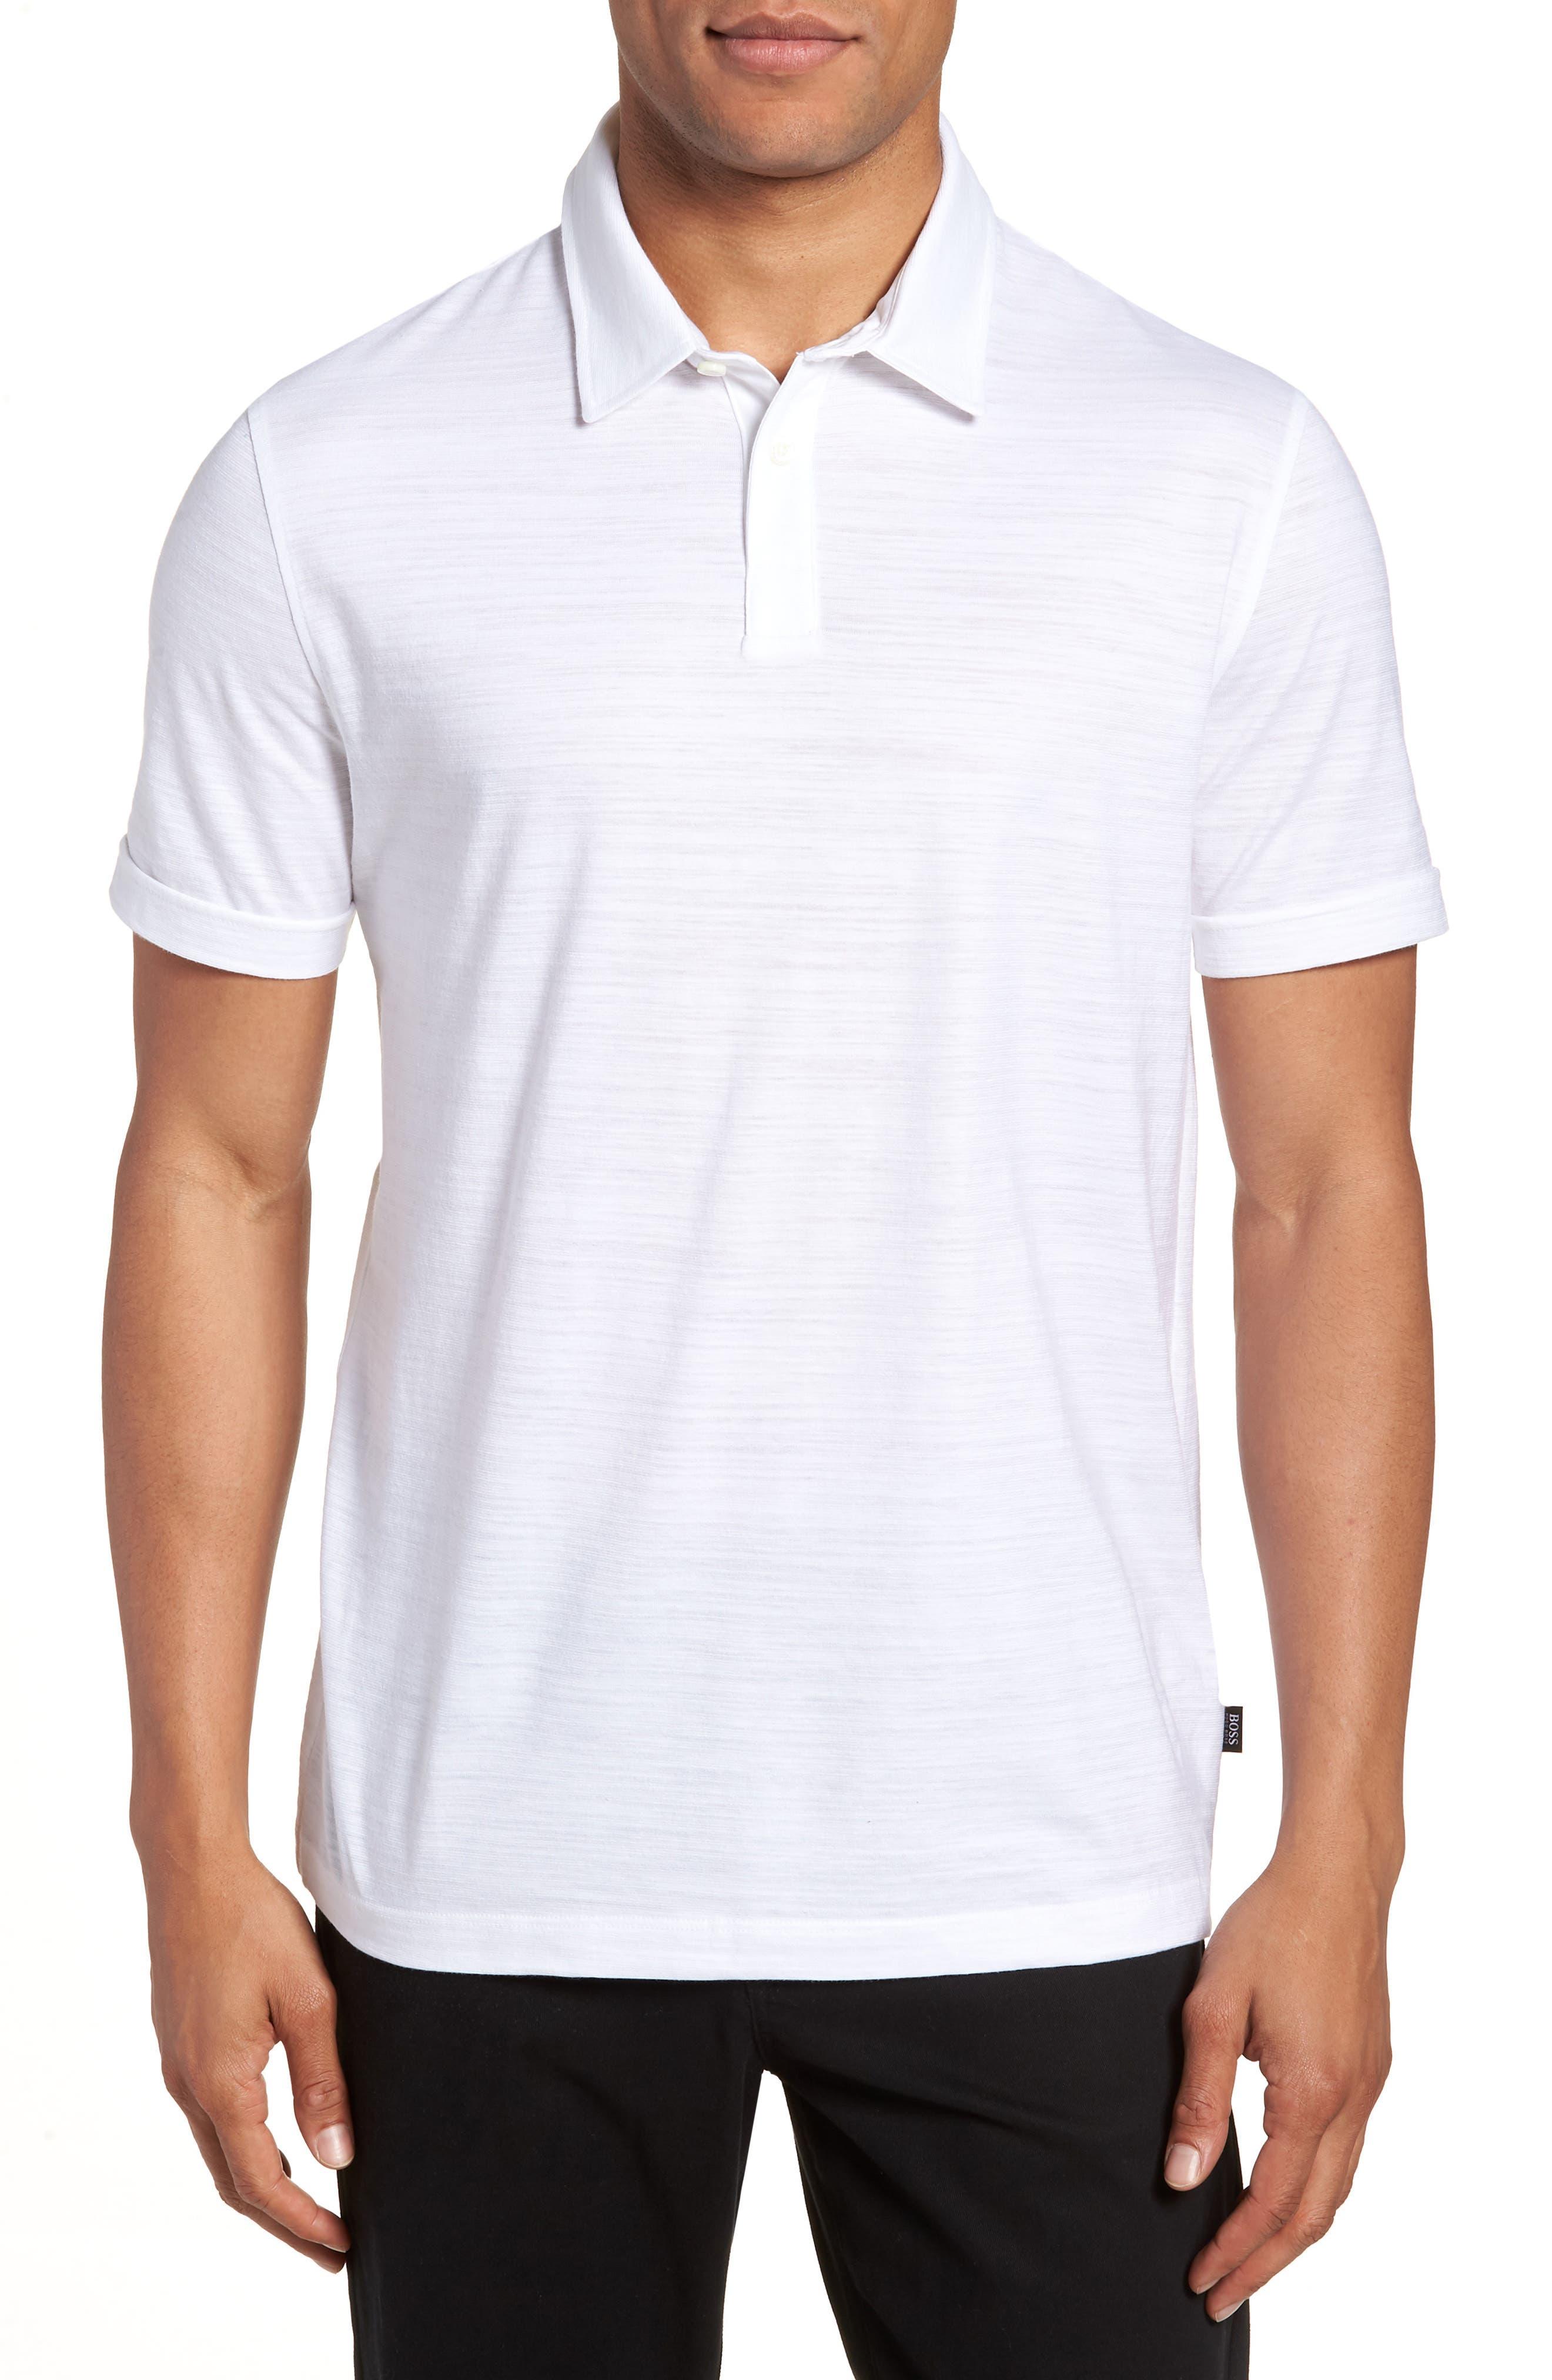 Main Image - BOSS Press Flame Slim Fit Polo Shirt